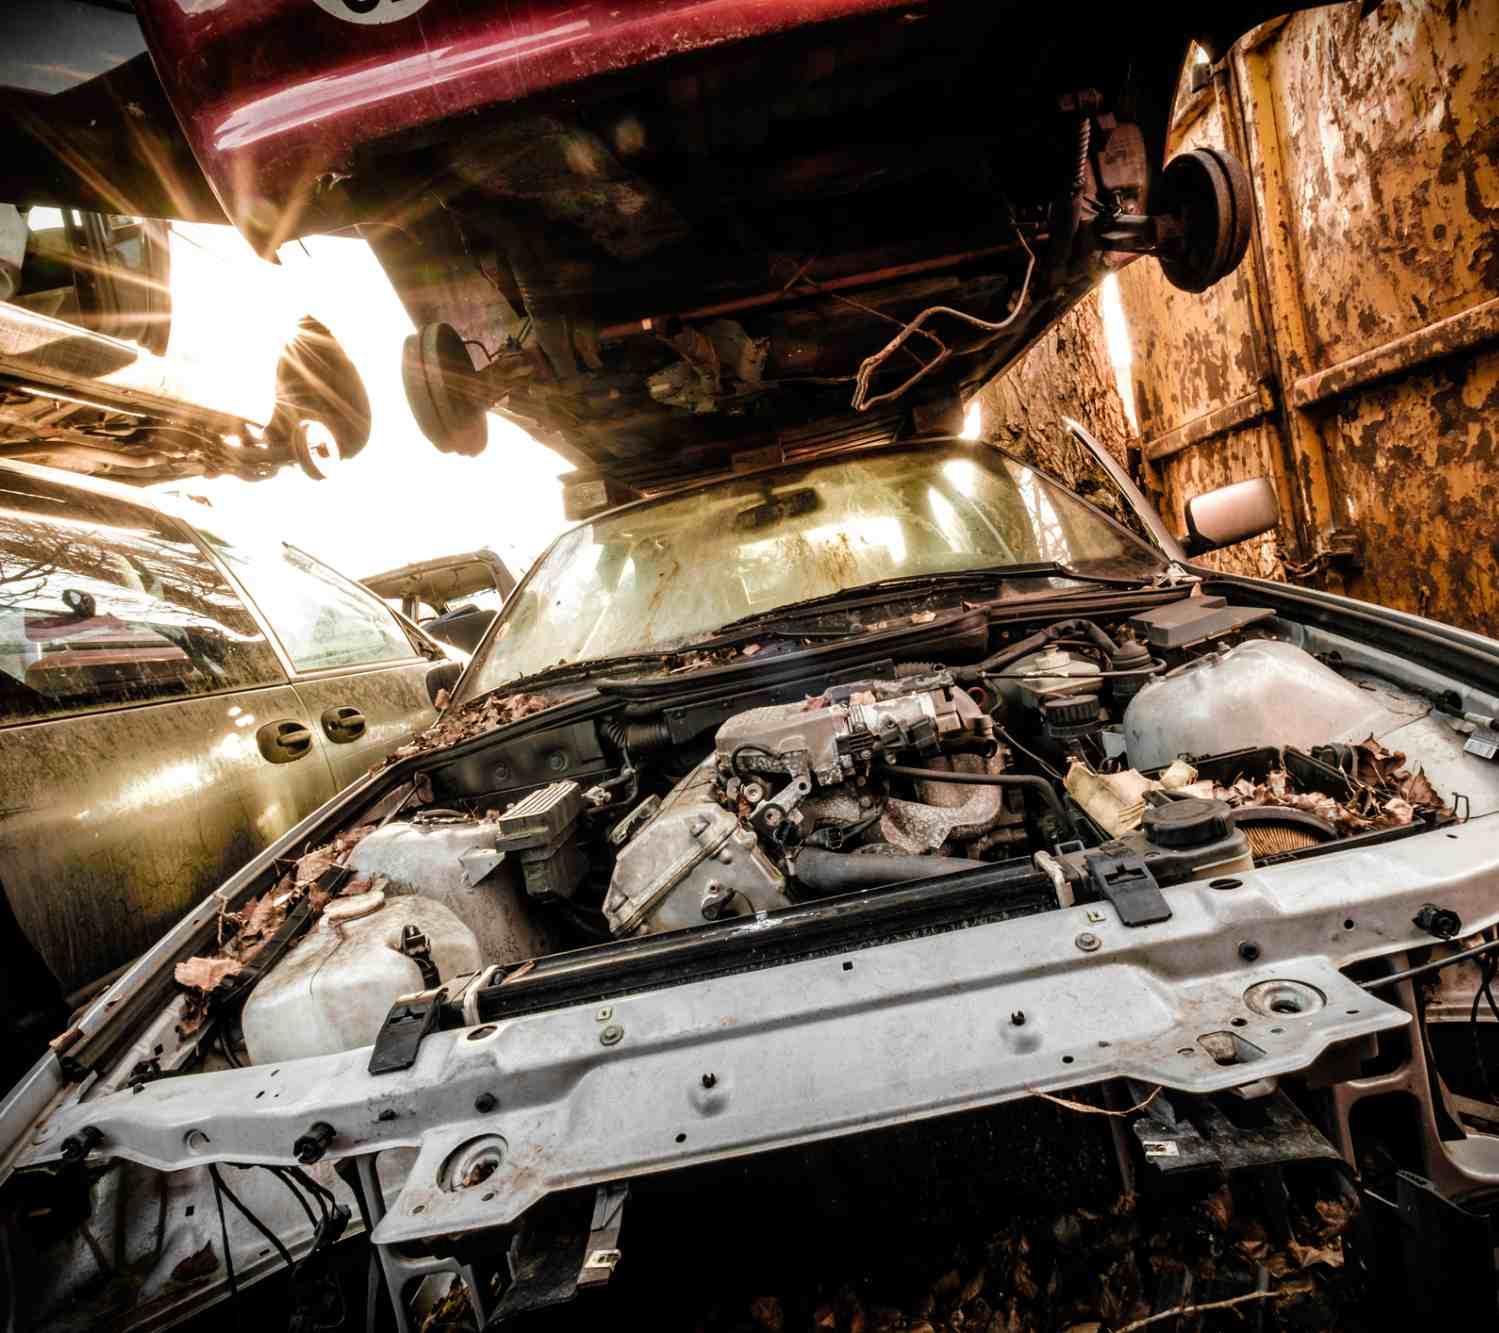 junkyard cars and engines